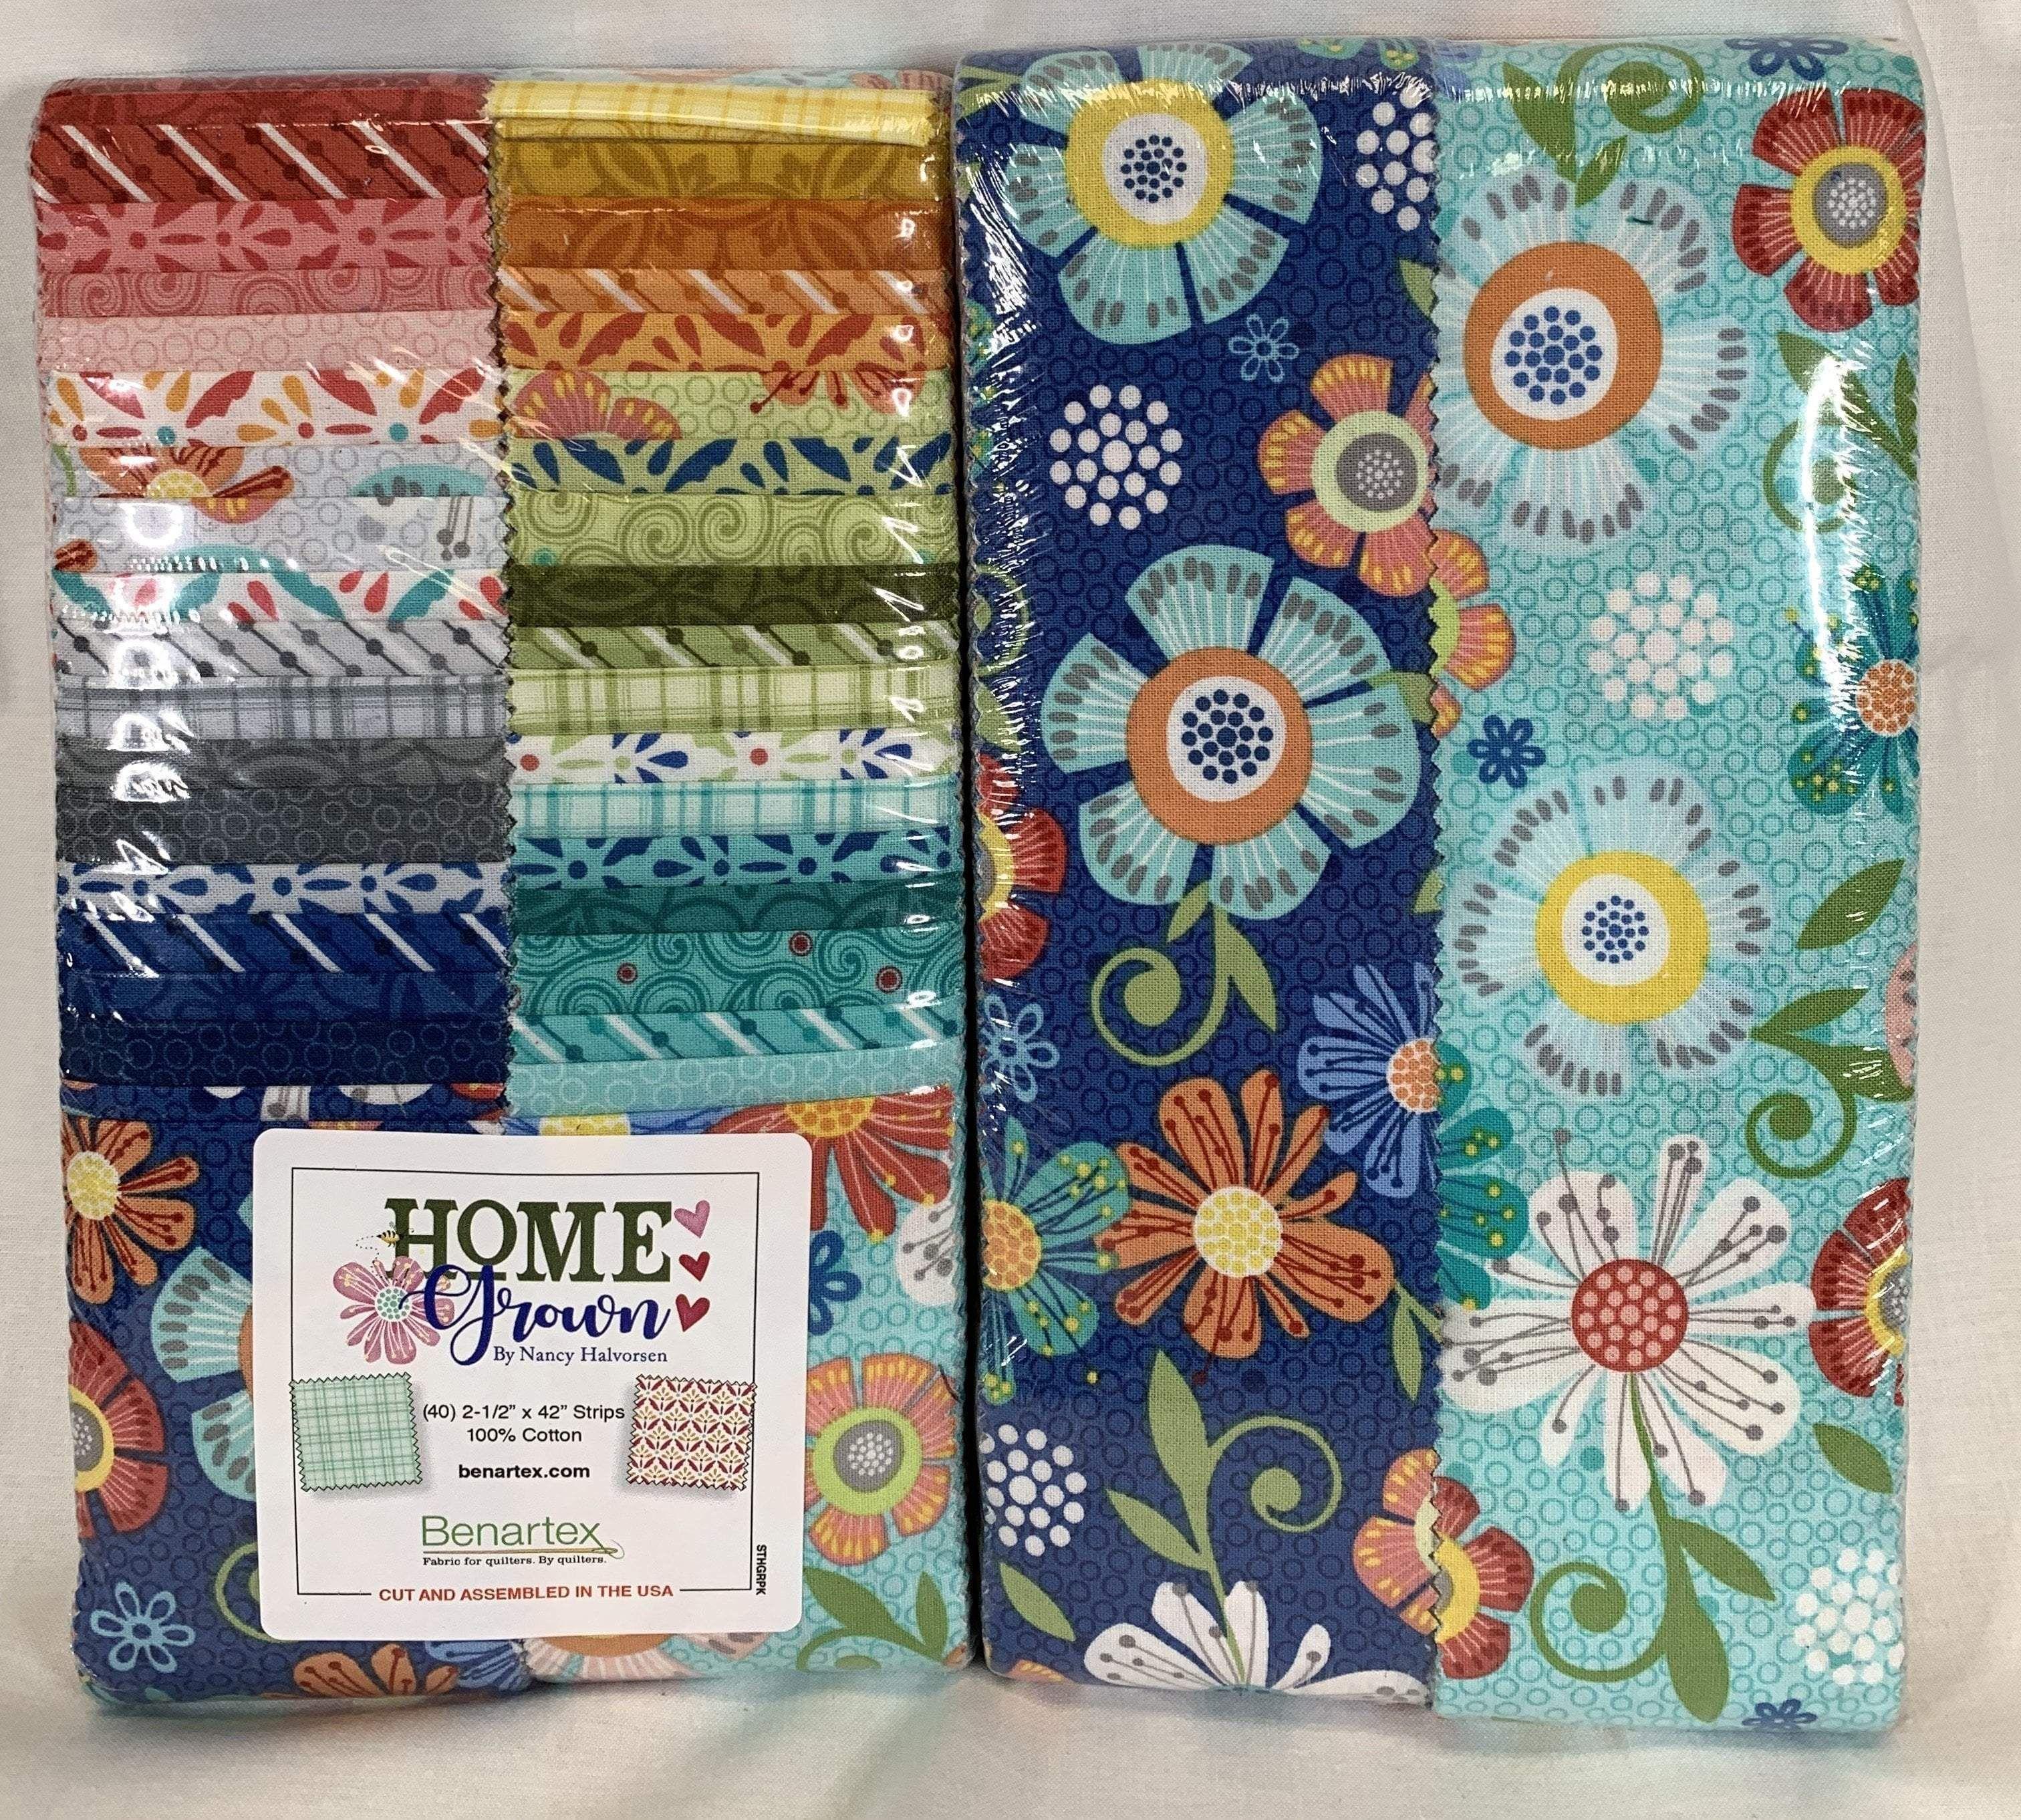 Benartex Home Grown Floral Aqua Cotton Quilting Craft Fabric